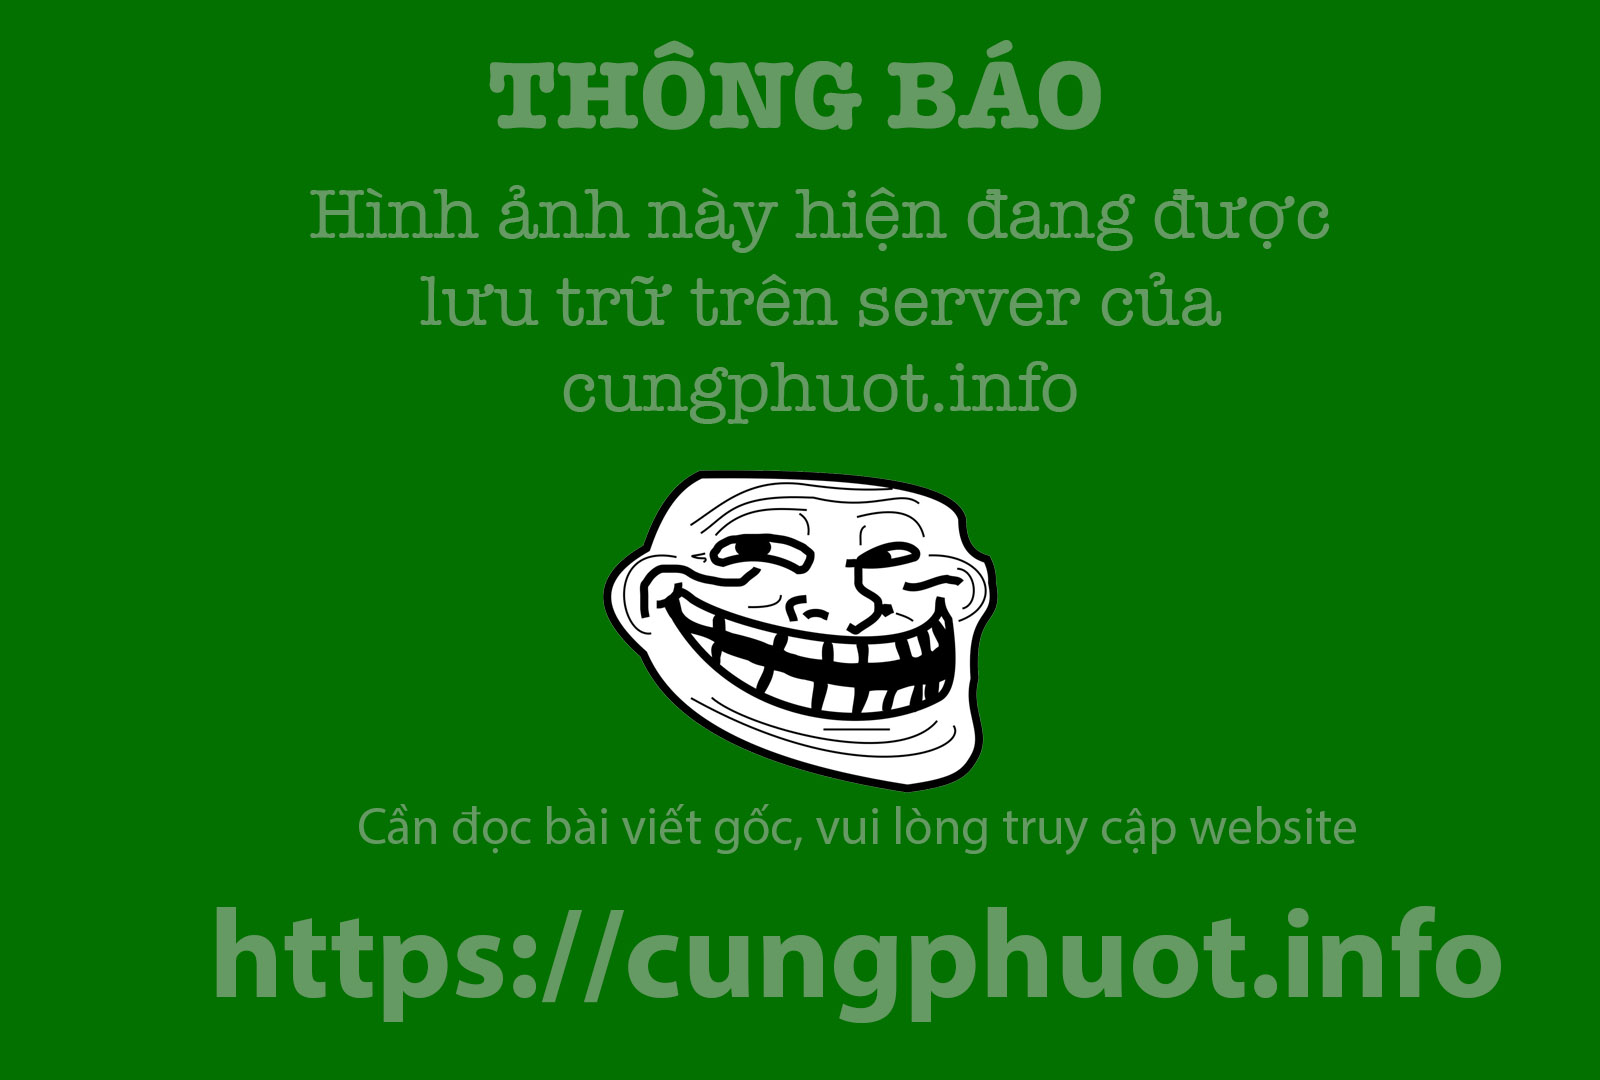 nhung-tiem-ca-phe-dep-phai-di-mot-lan-cho-biet-o-da-nang-ivivu-5